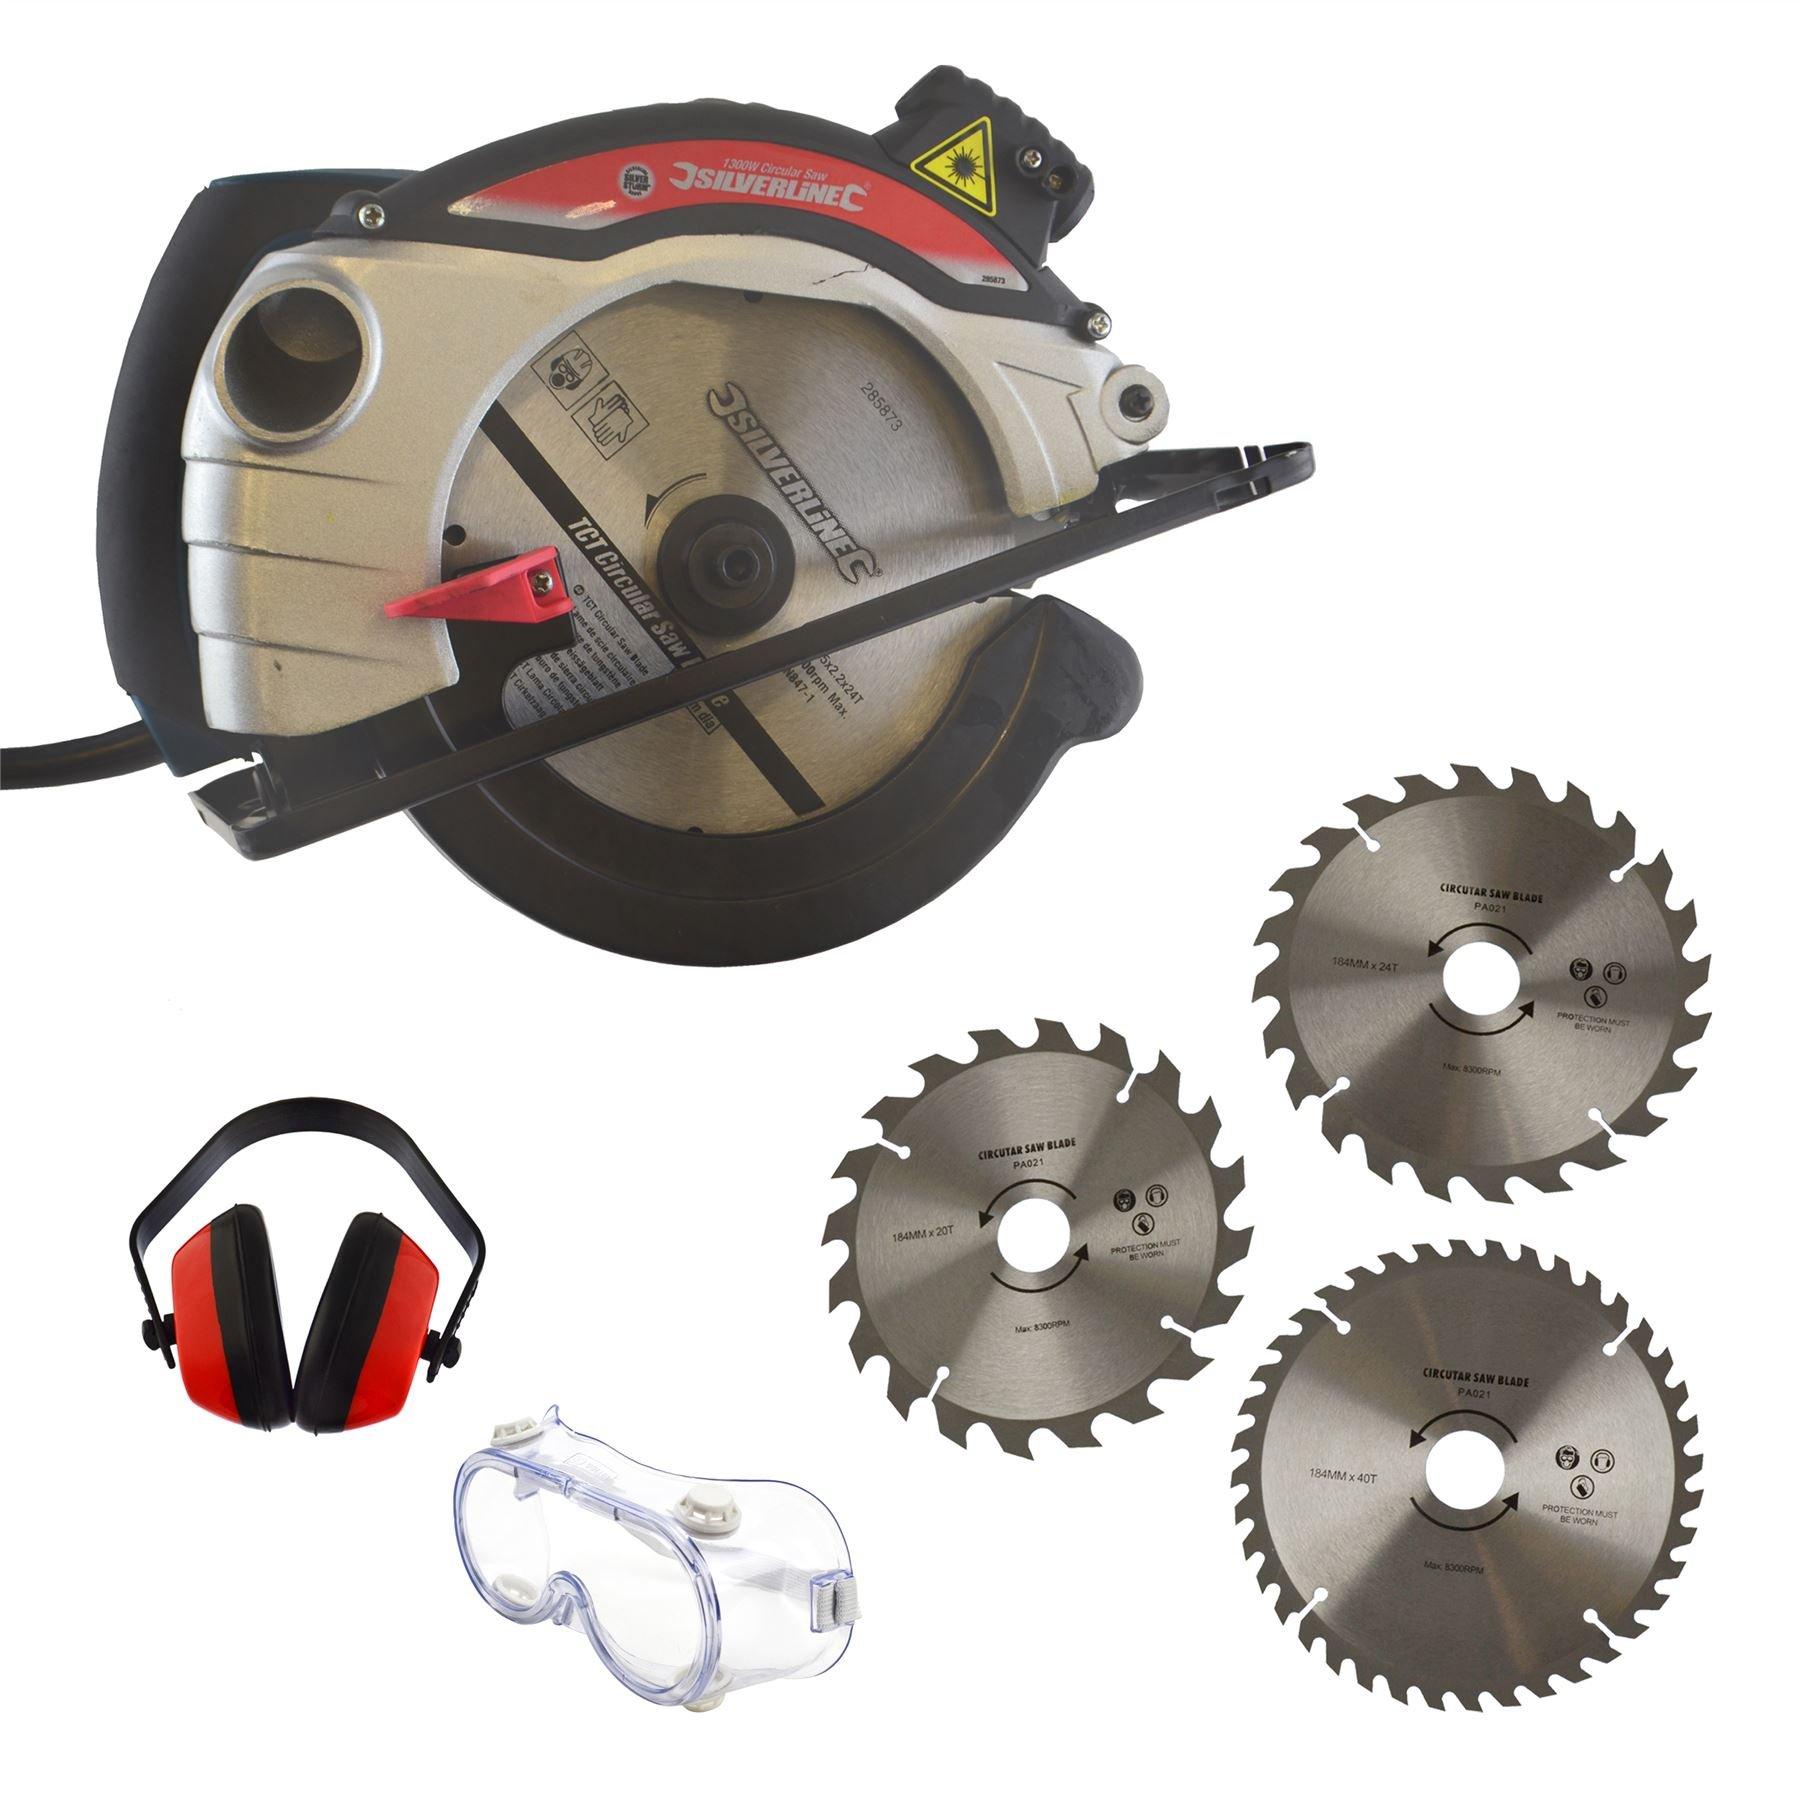 1300w Circular Saw 185mm Blade & 3 Spare Blades / Ear & Eye Safety Protection